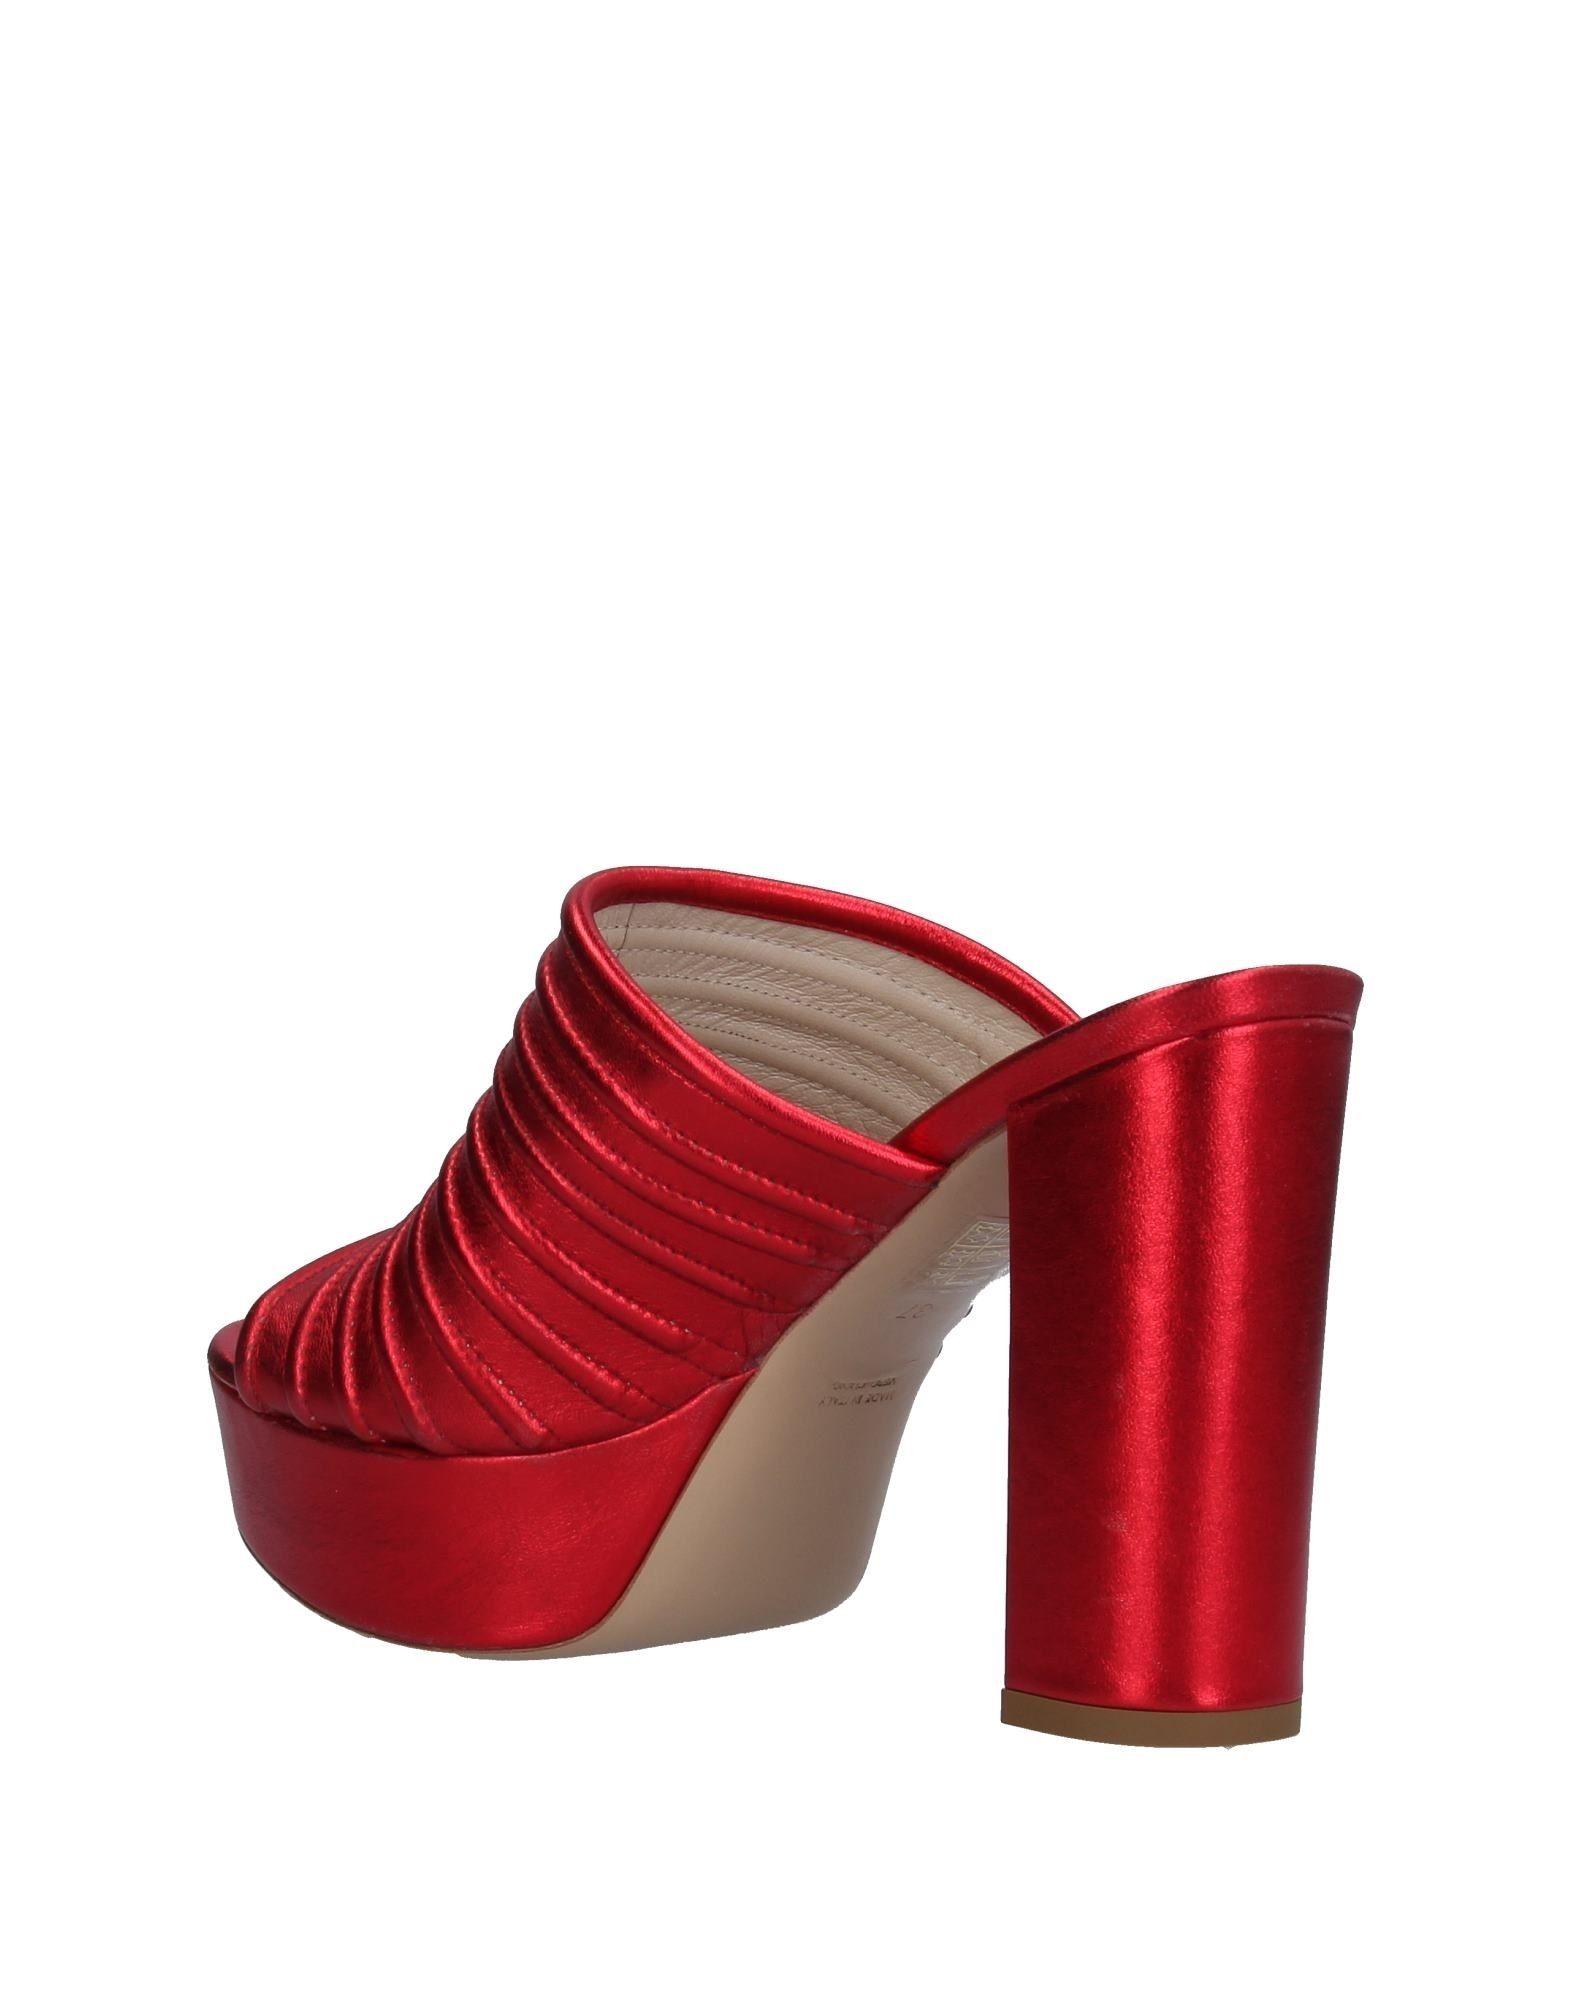 Stilvolle billige Schuhe Damen Spaziomoda Sandalen Damen Schuhe  11342678XB 8aecb9